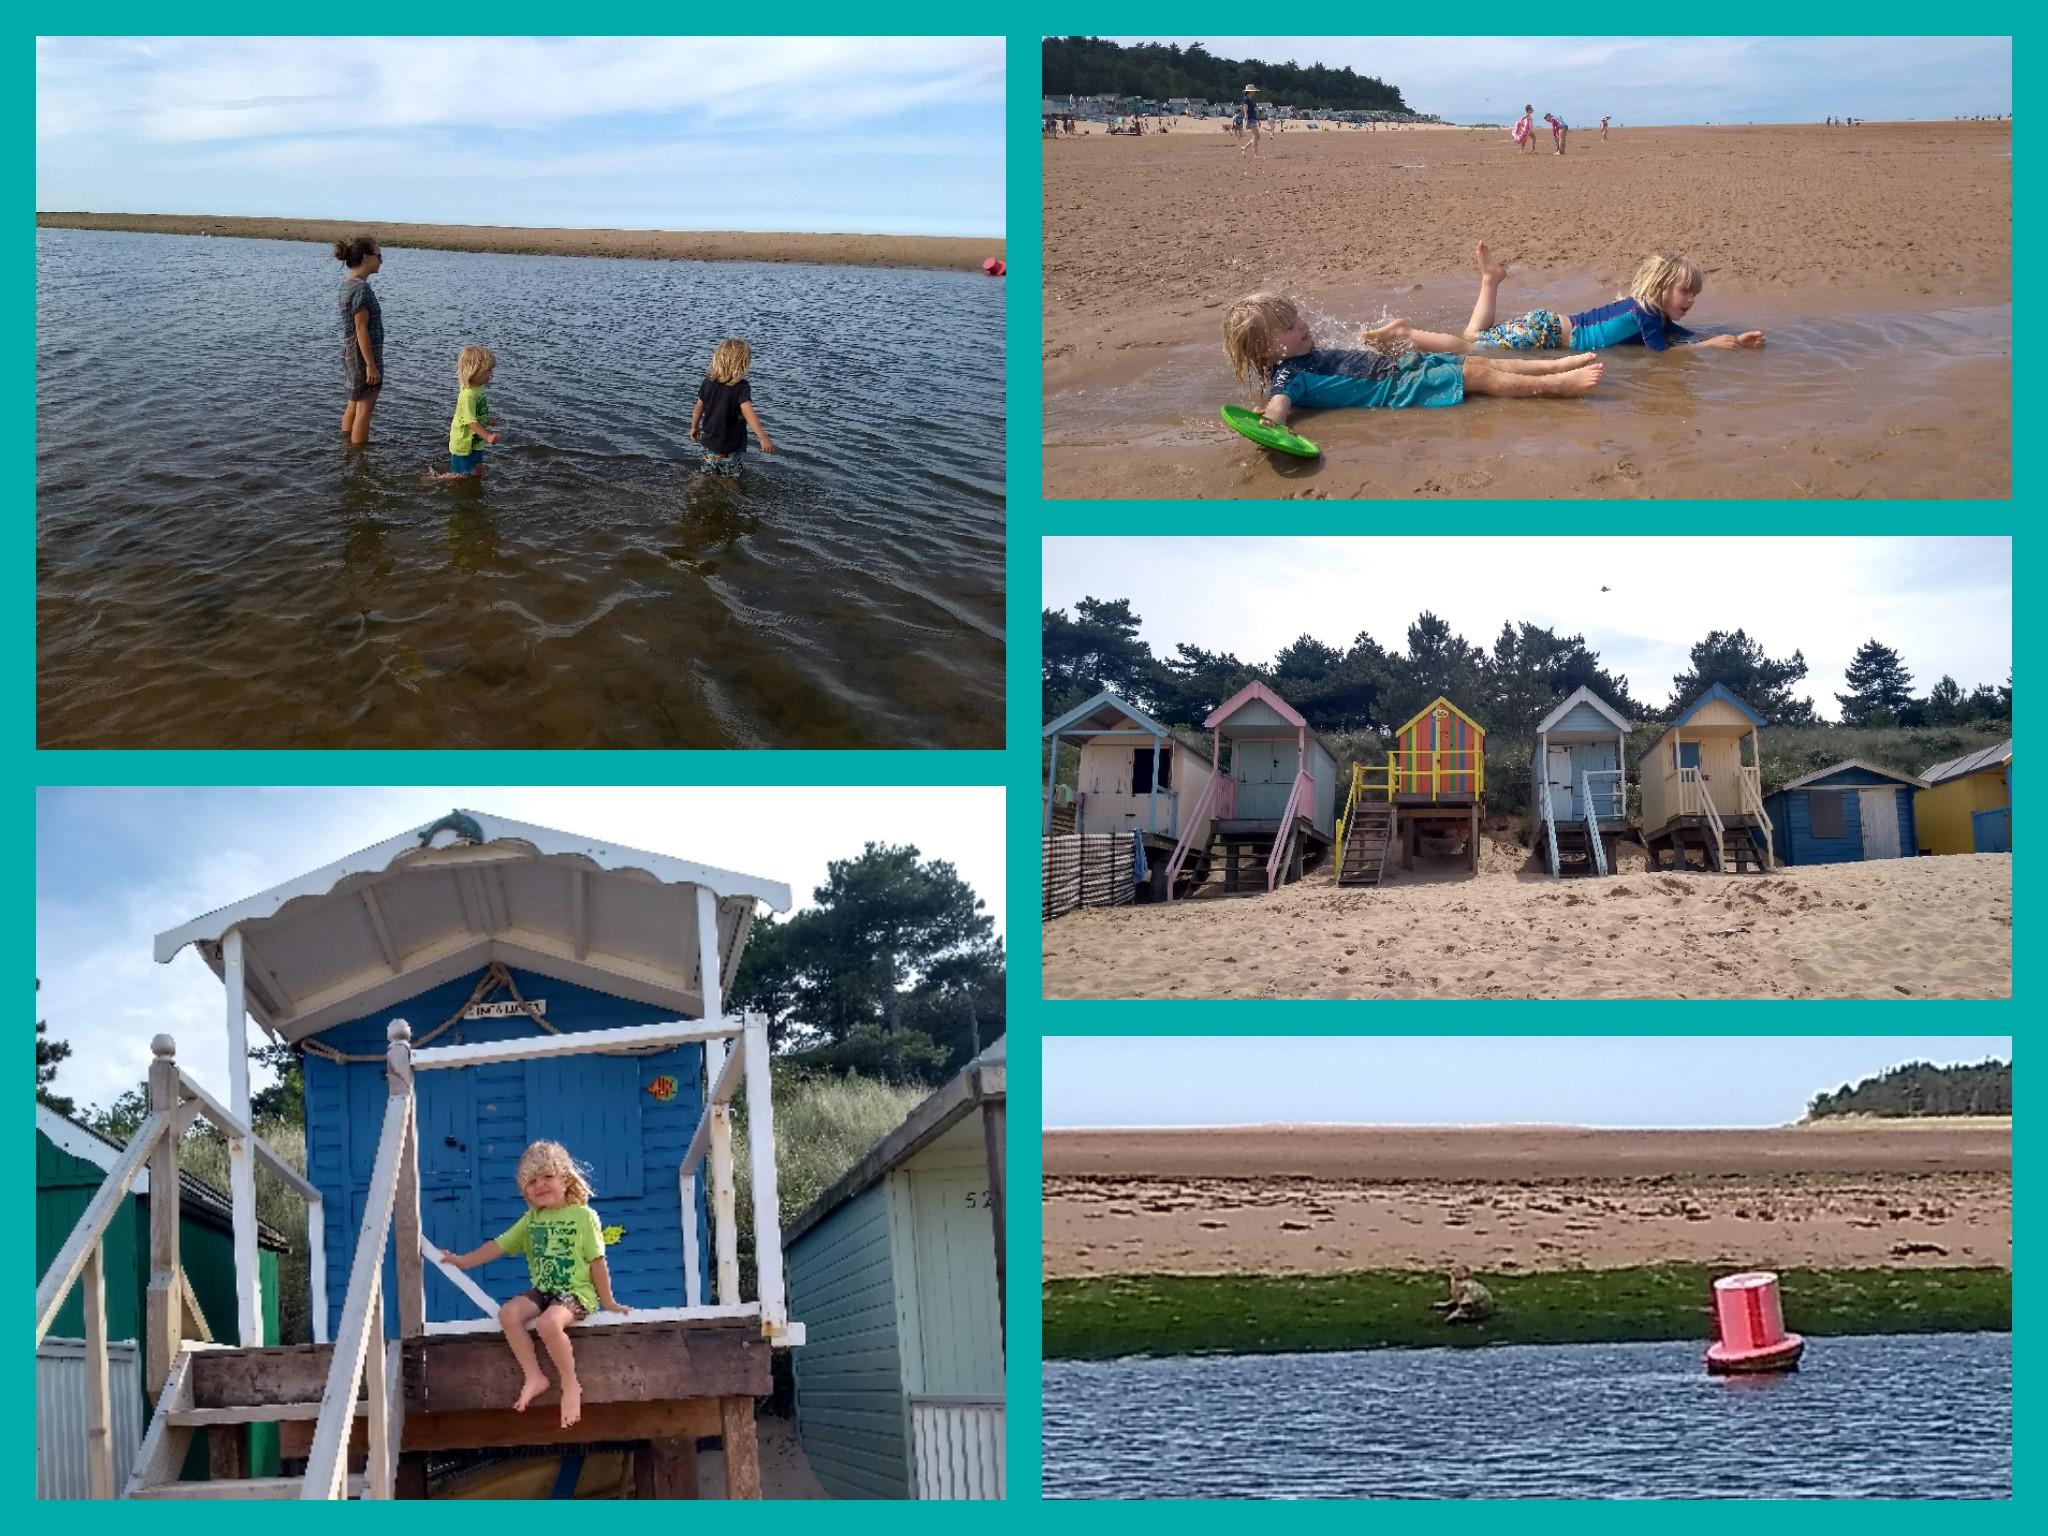 Wells-next-the-sea beach fun